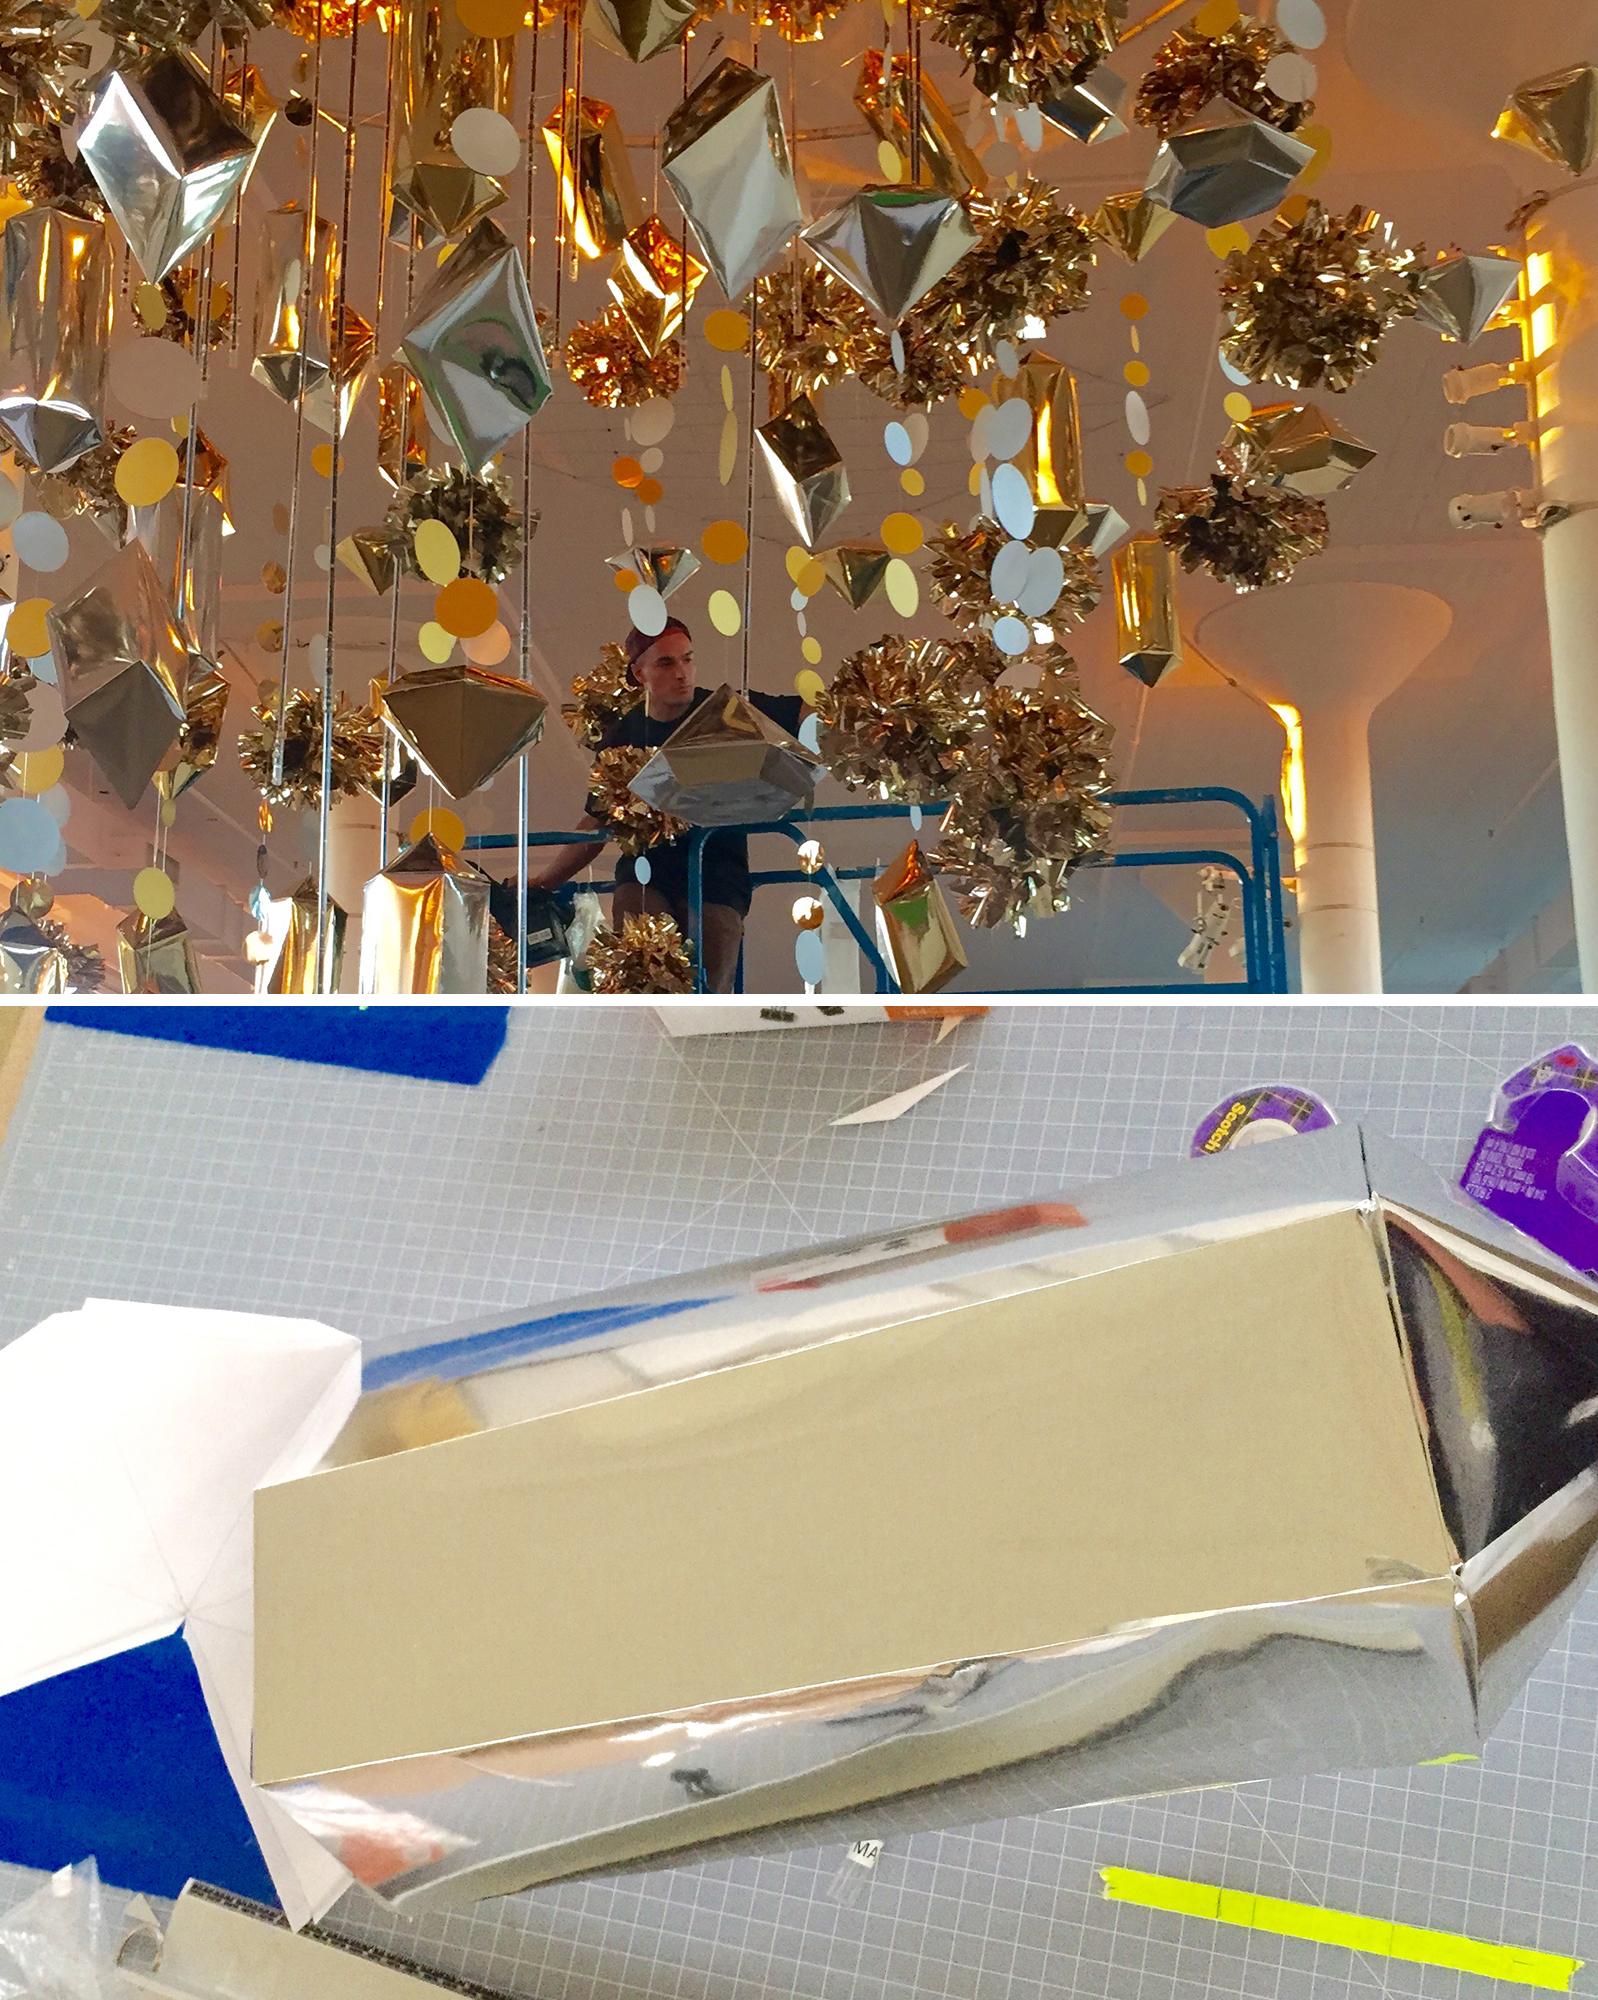 darcys-diary-chandelier-sq-1015_vert.jpg